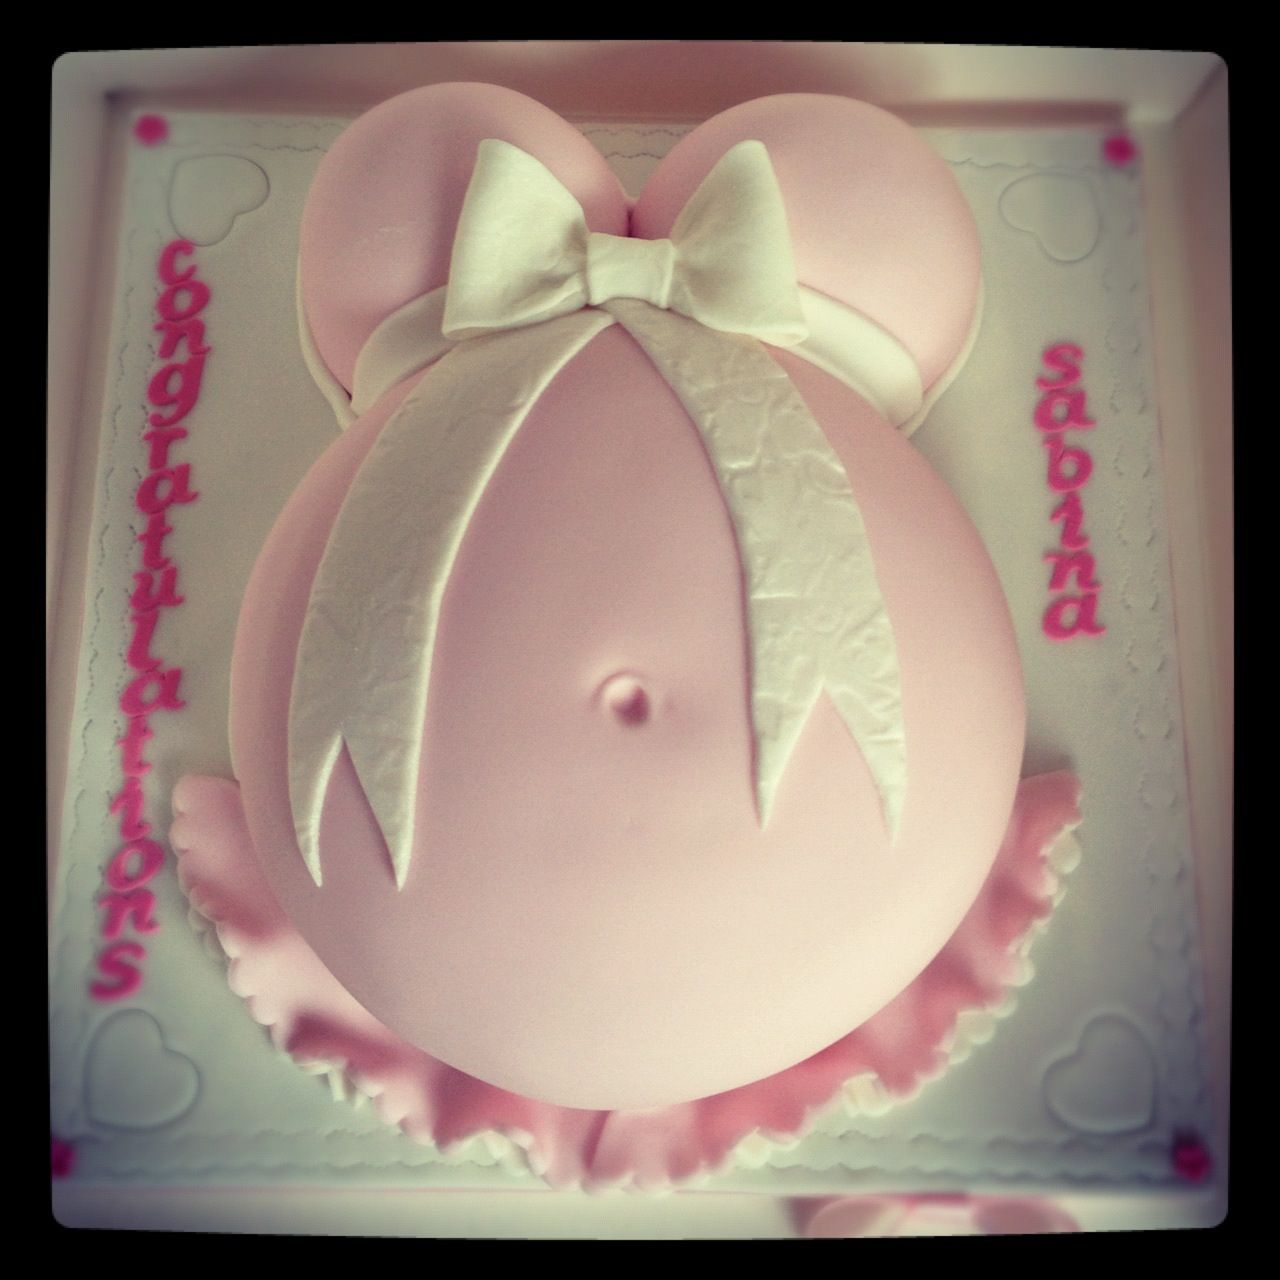 Baby Bump Cake Images : Baby bump cake Belly Cake/Bump Cake Pinterest